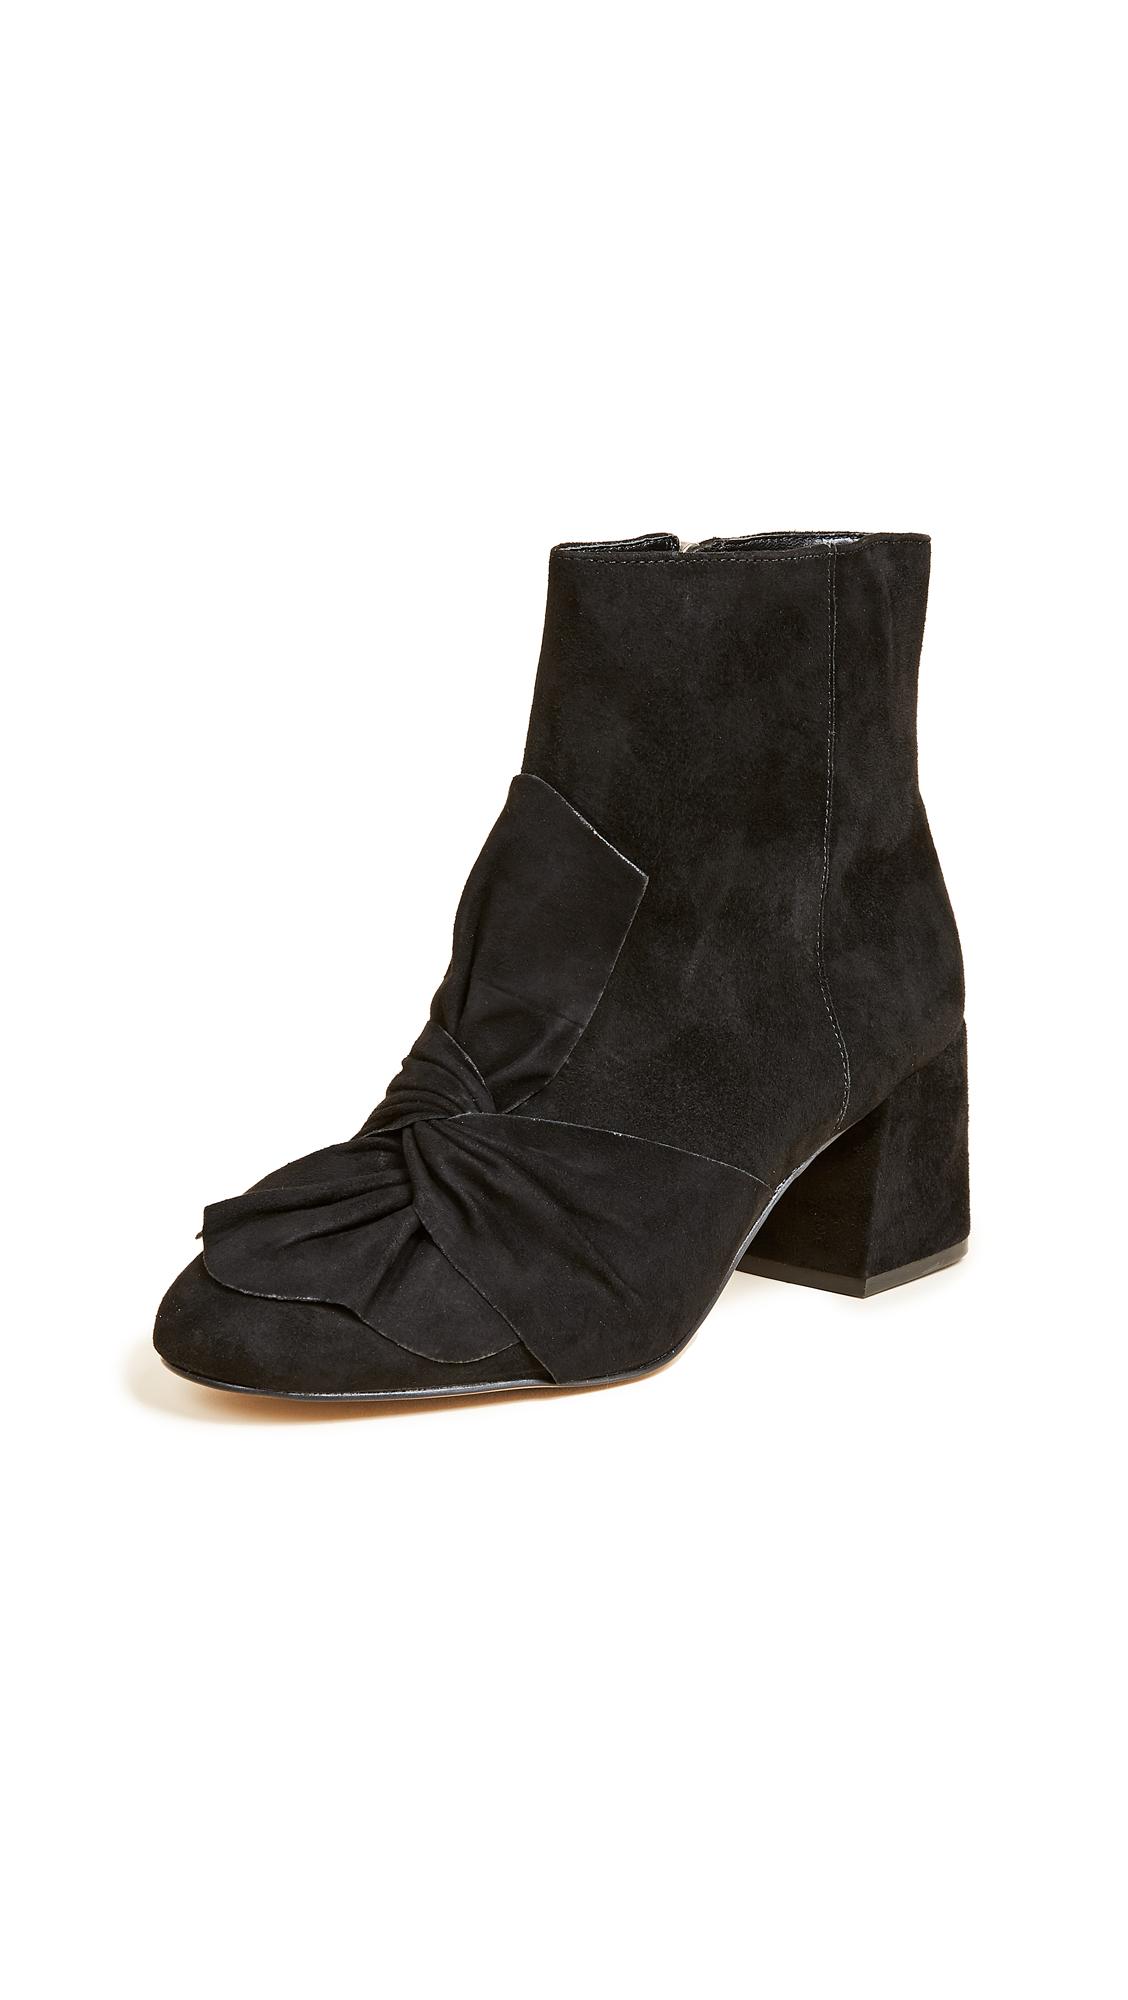 Rebecca Minkoff Lara Bow Booties - Black